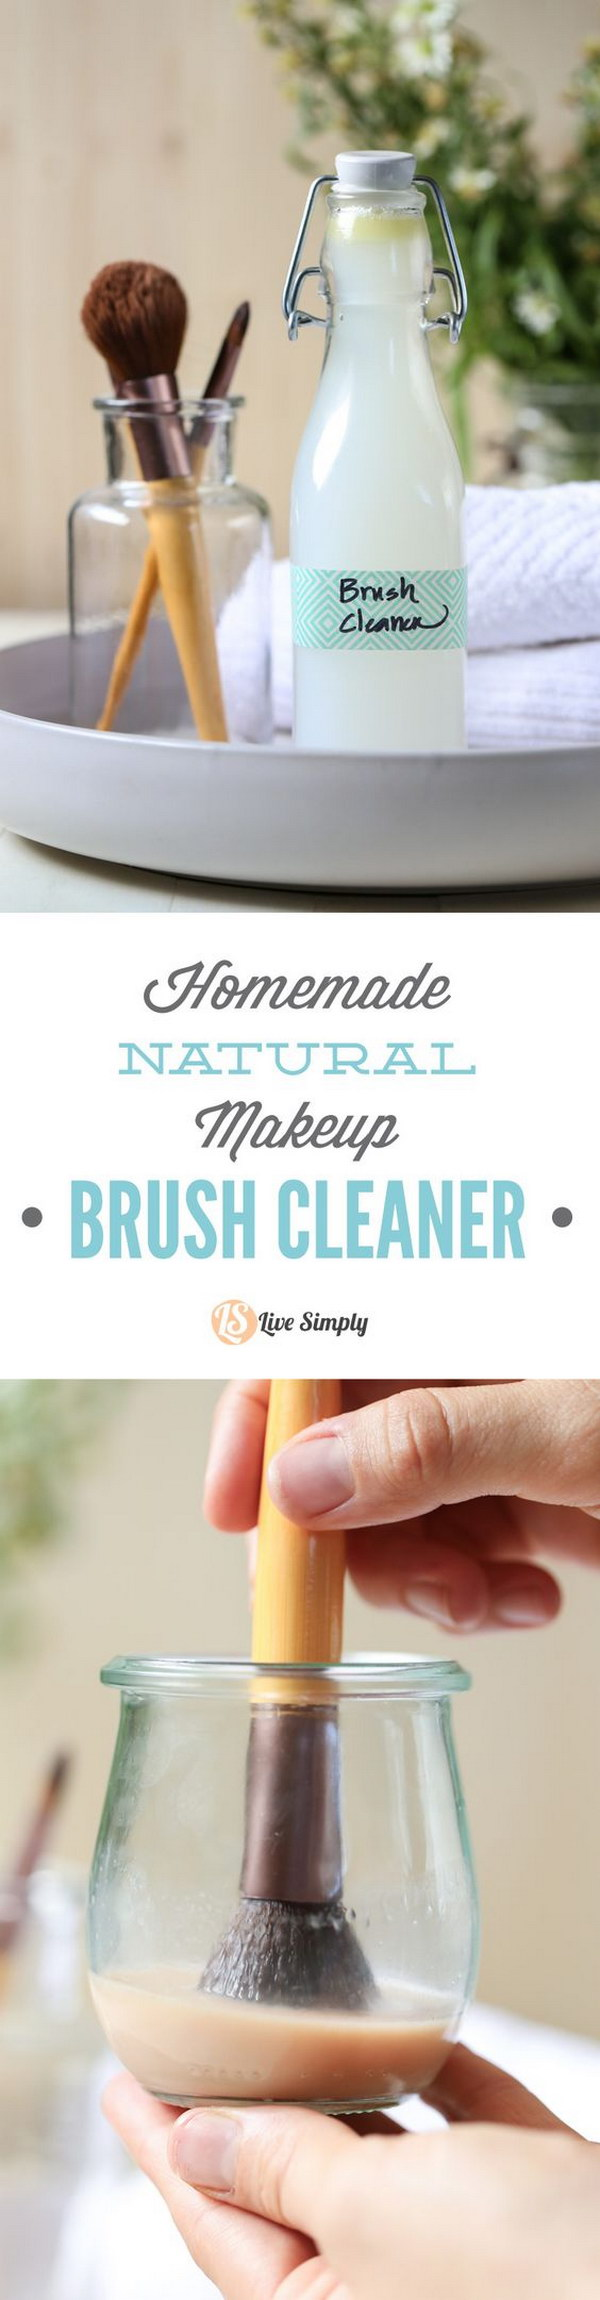 Homemade Natural Makeup Brush Cleaner.